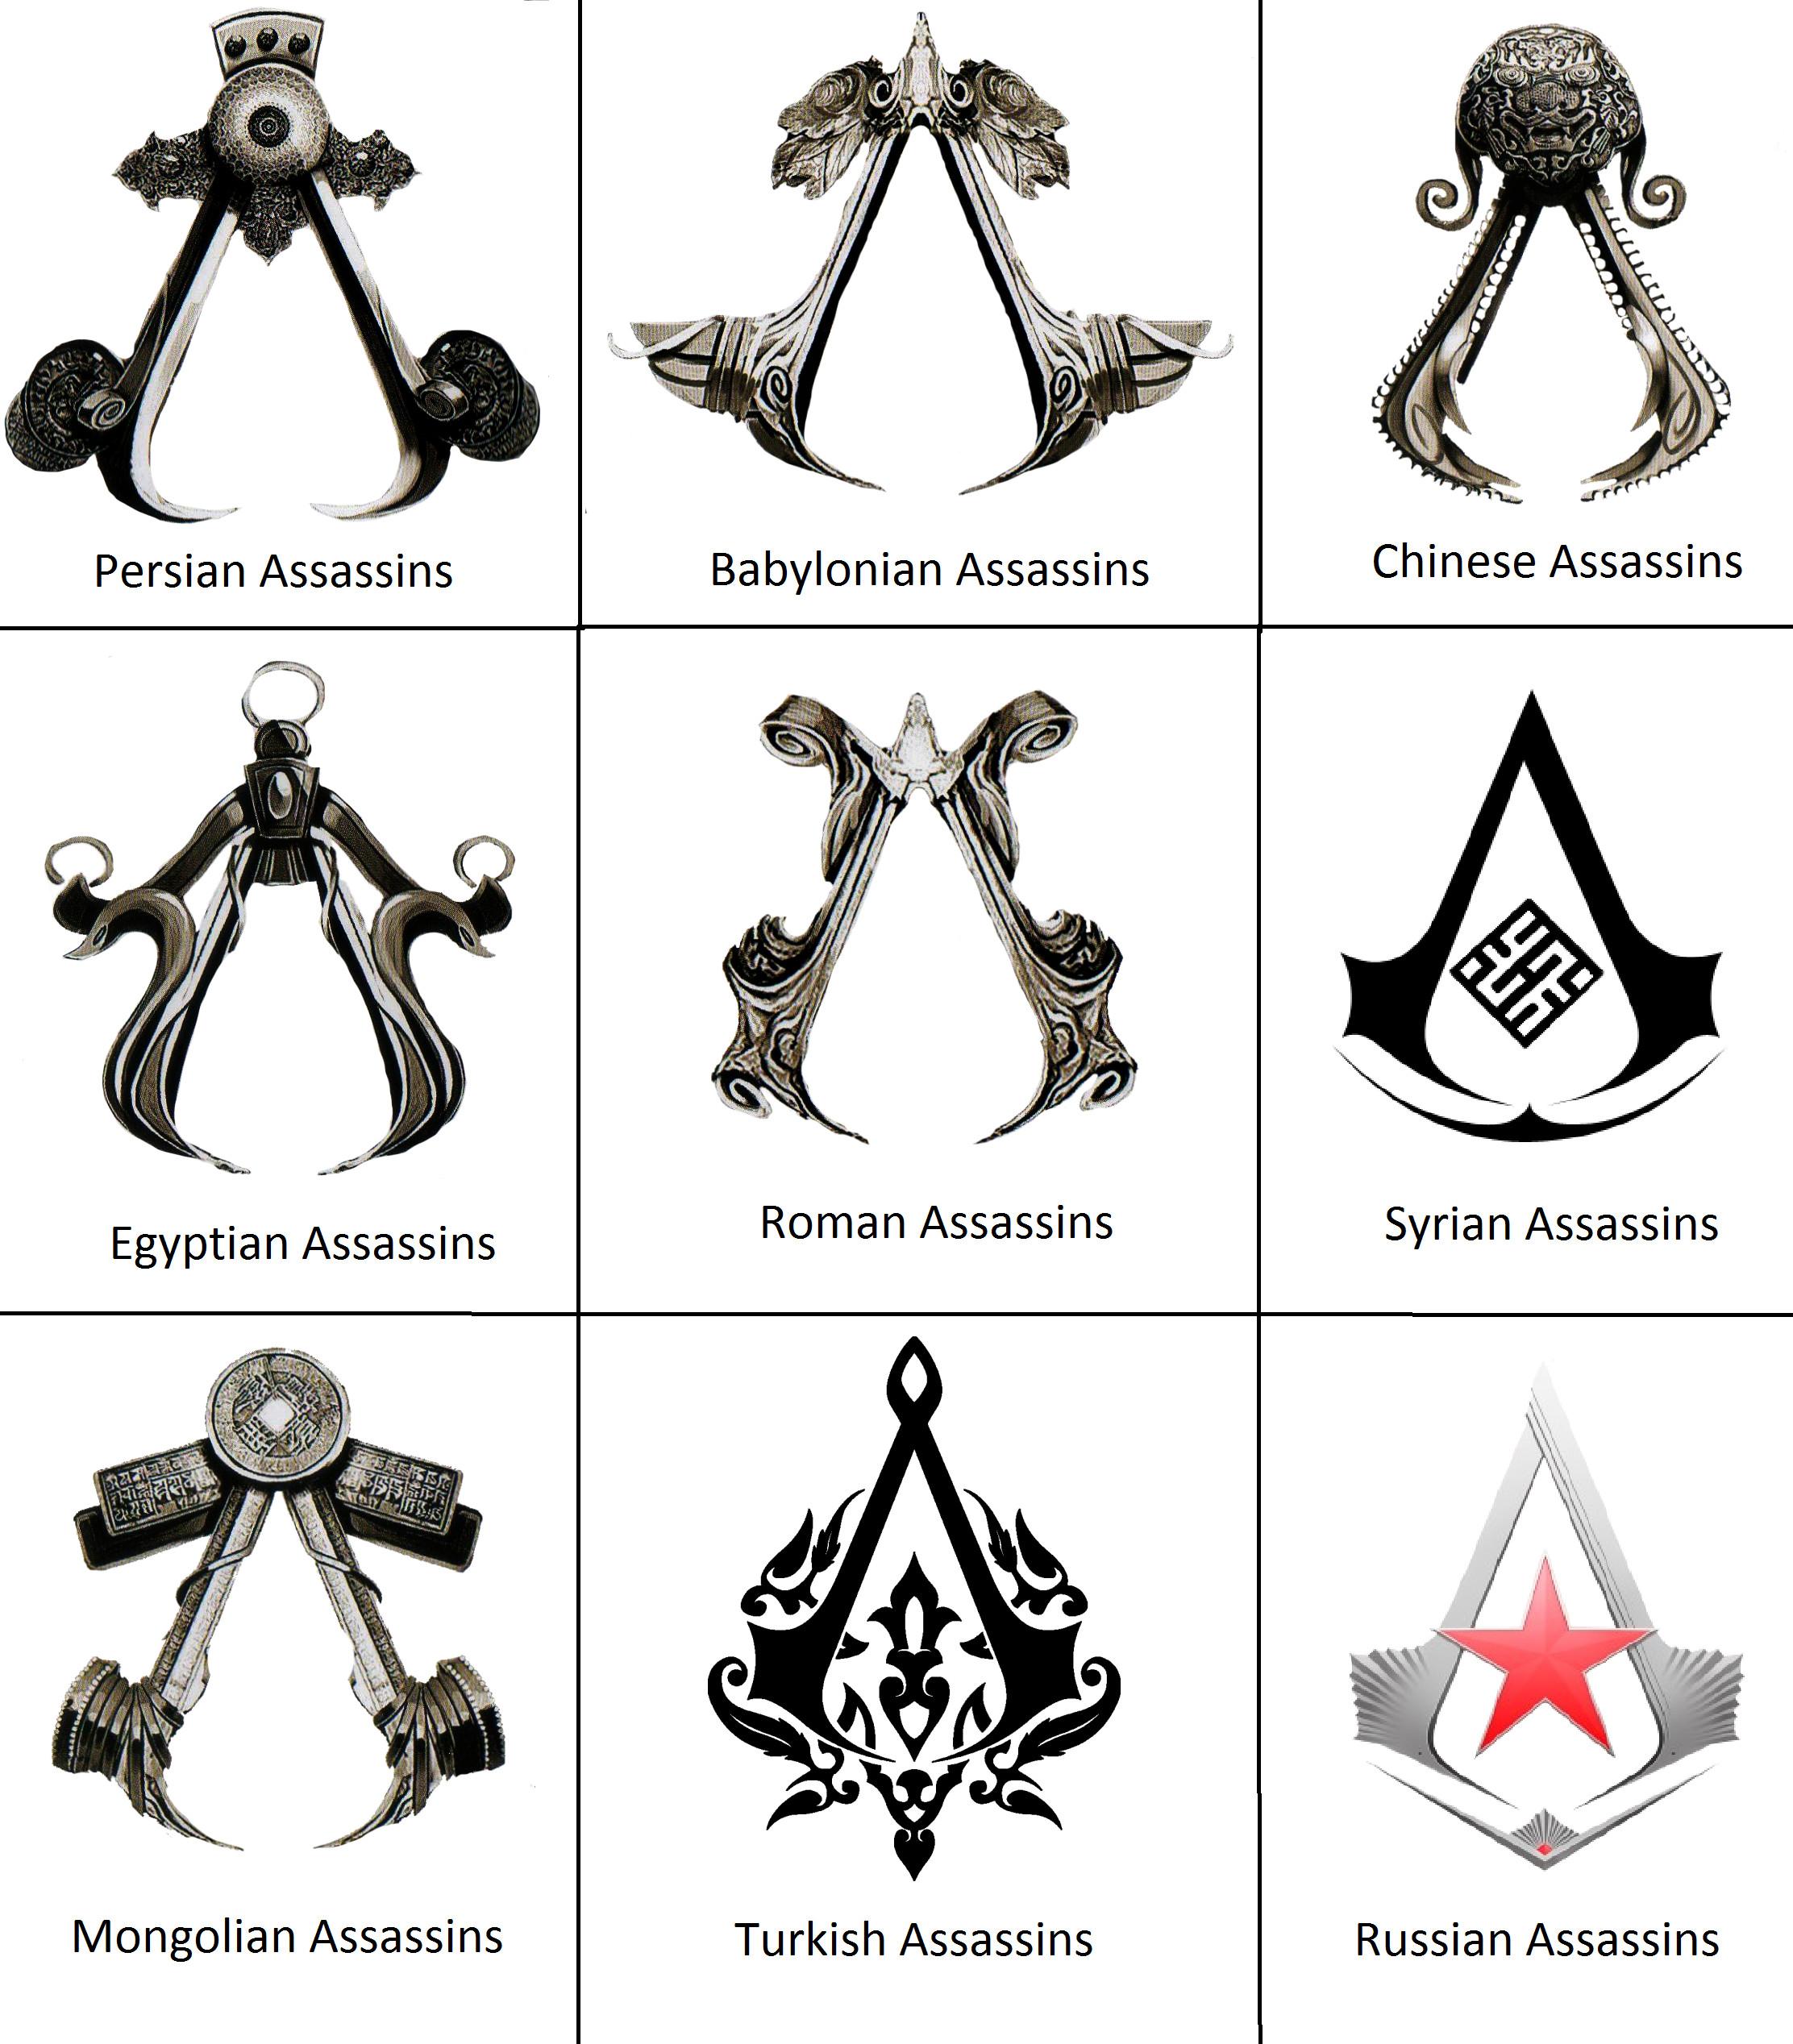 Symbols by 575750 on deviantart assassins symbols by 575750 assassins symbols by 575750 biocorpaavc Images